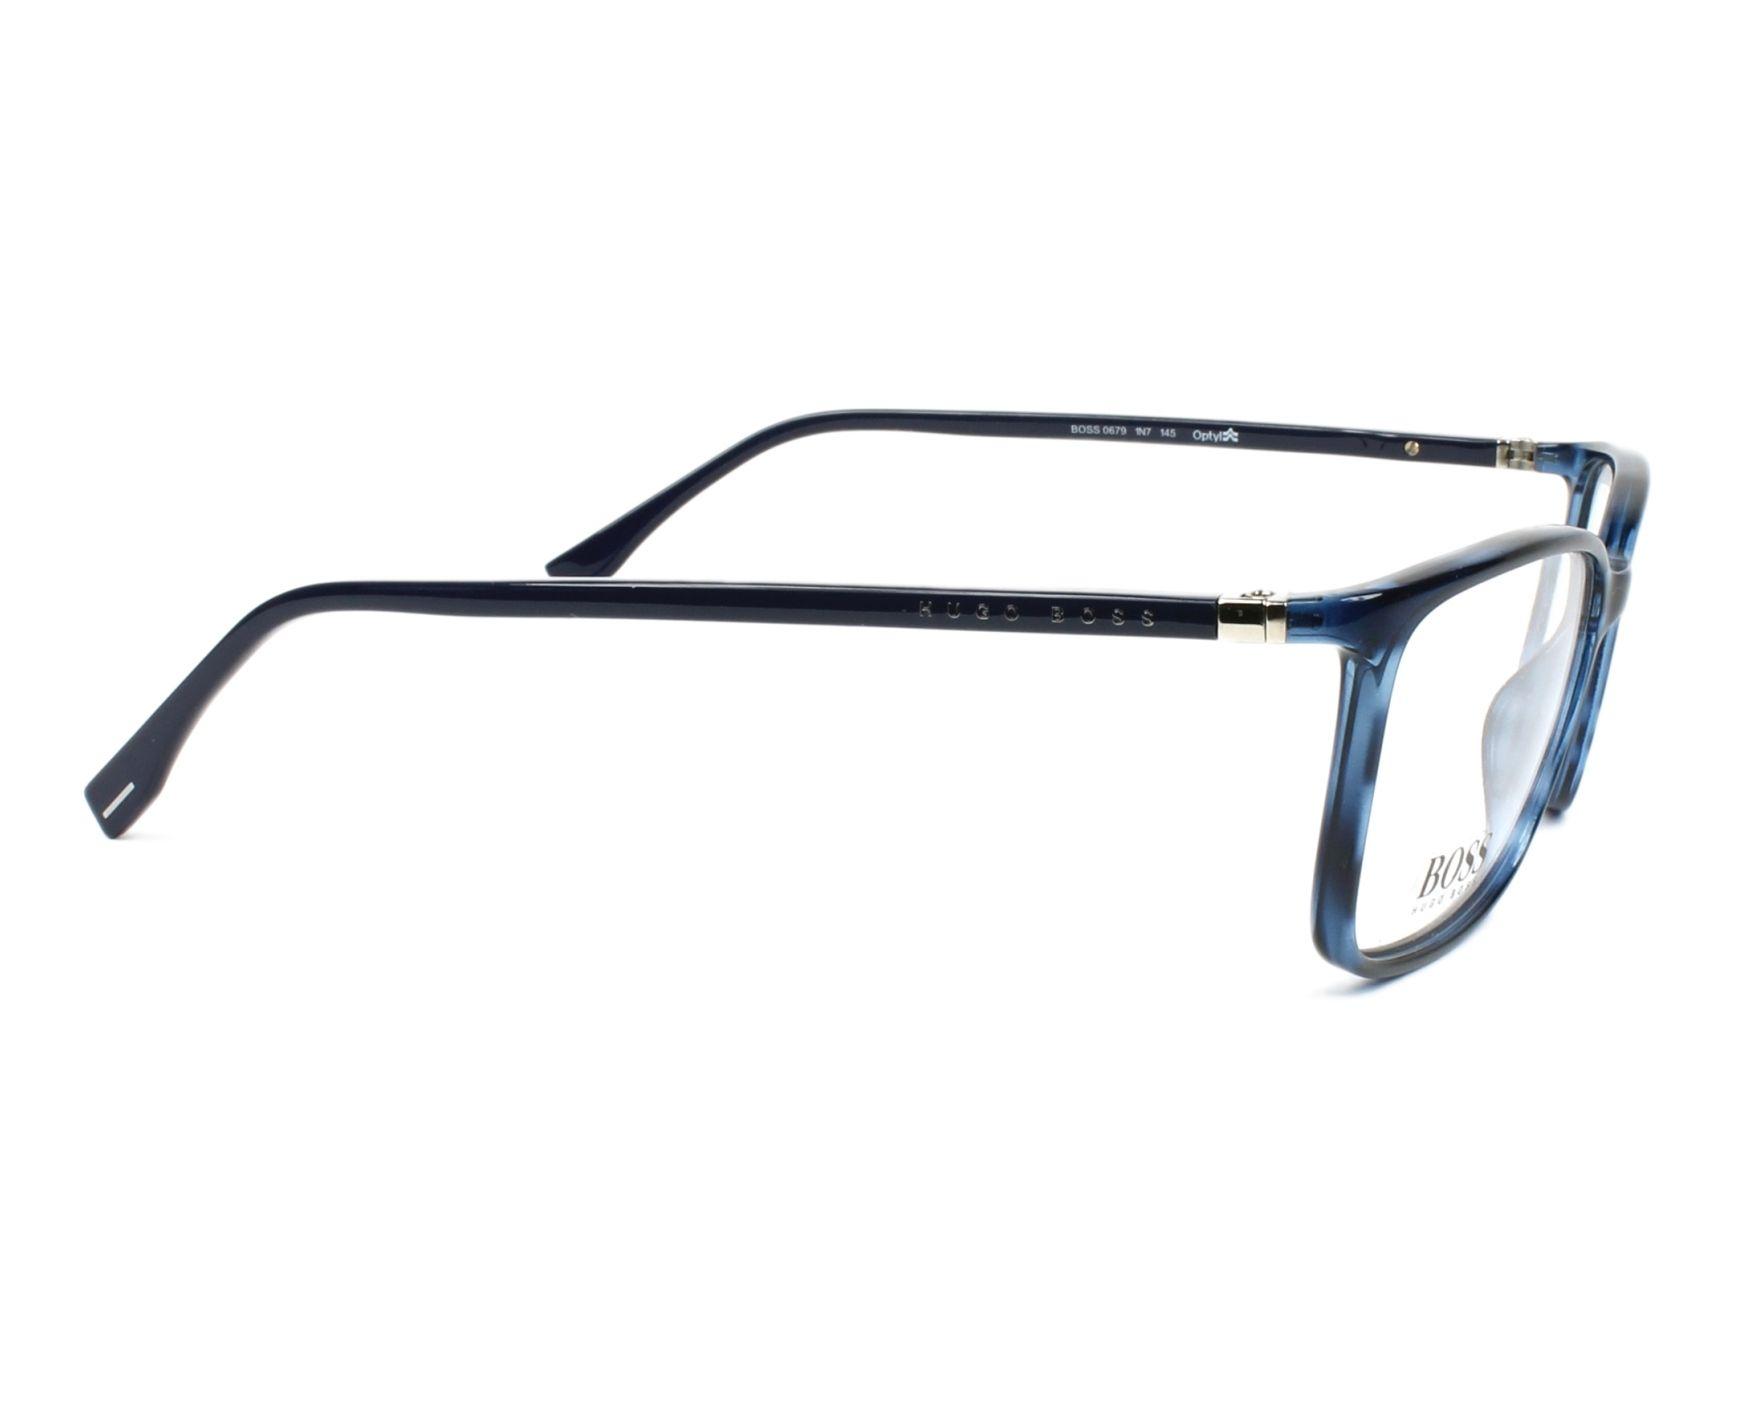 70a1cdd707f eyeglasses Hugo Boss BOSS-0679 38I 56-15 Blue side view